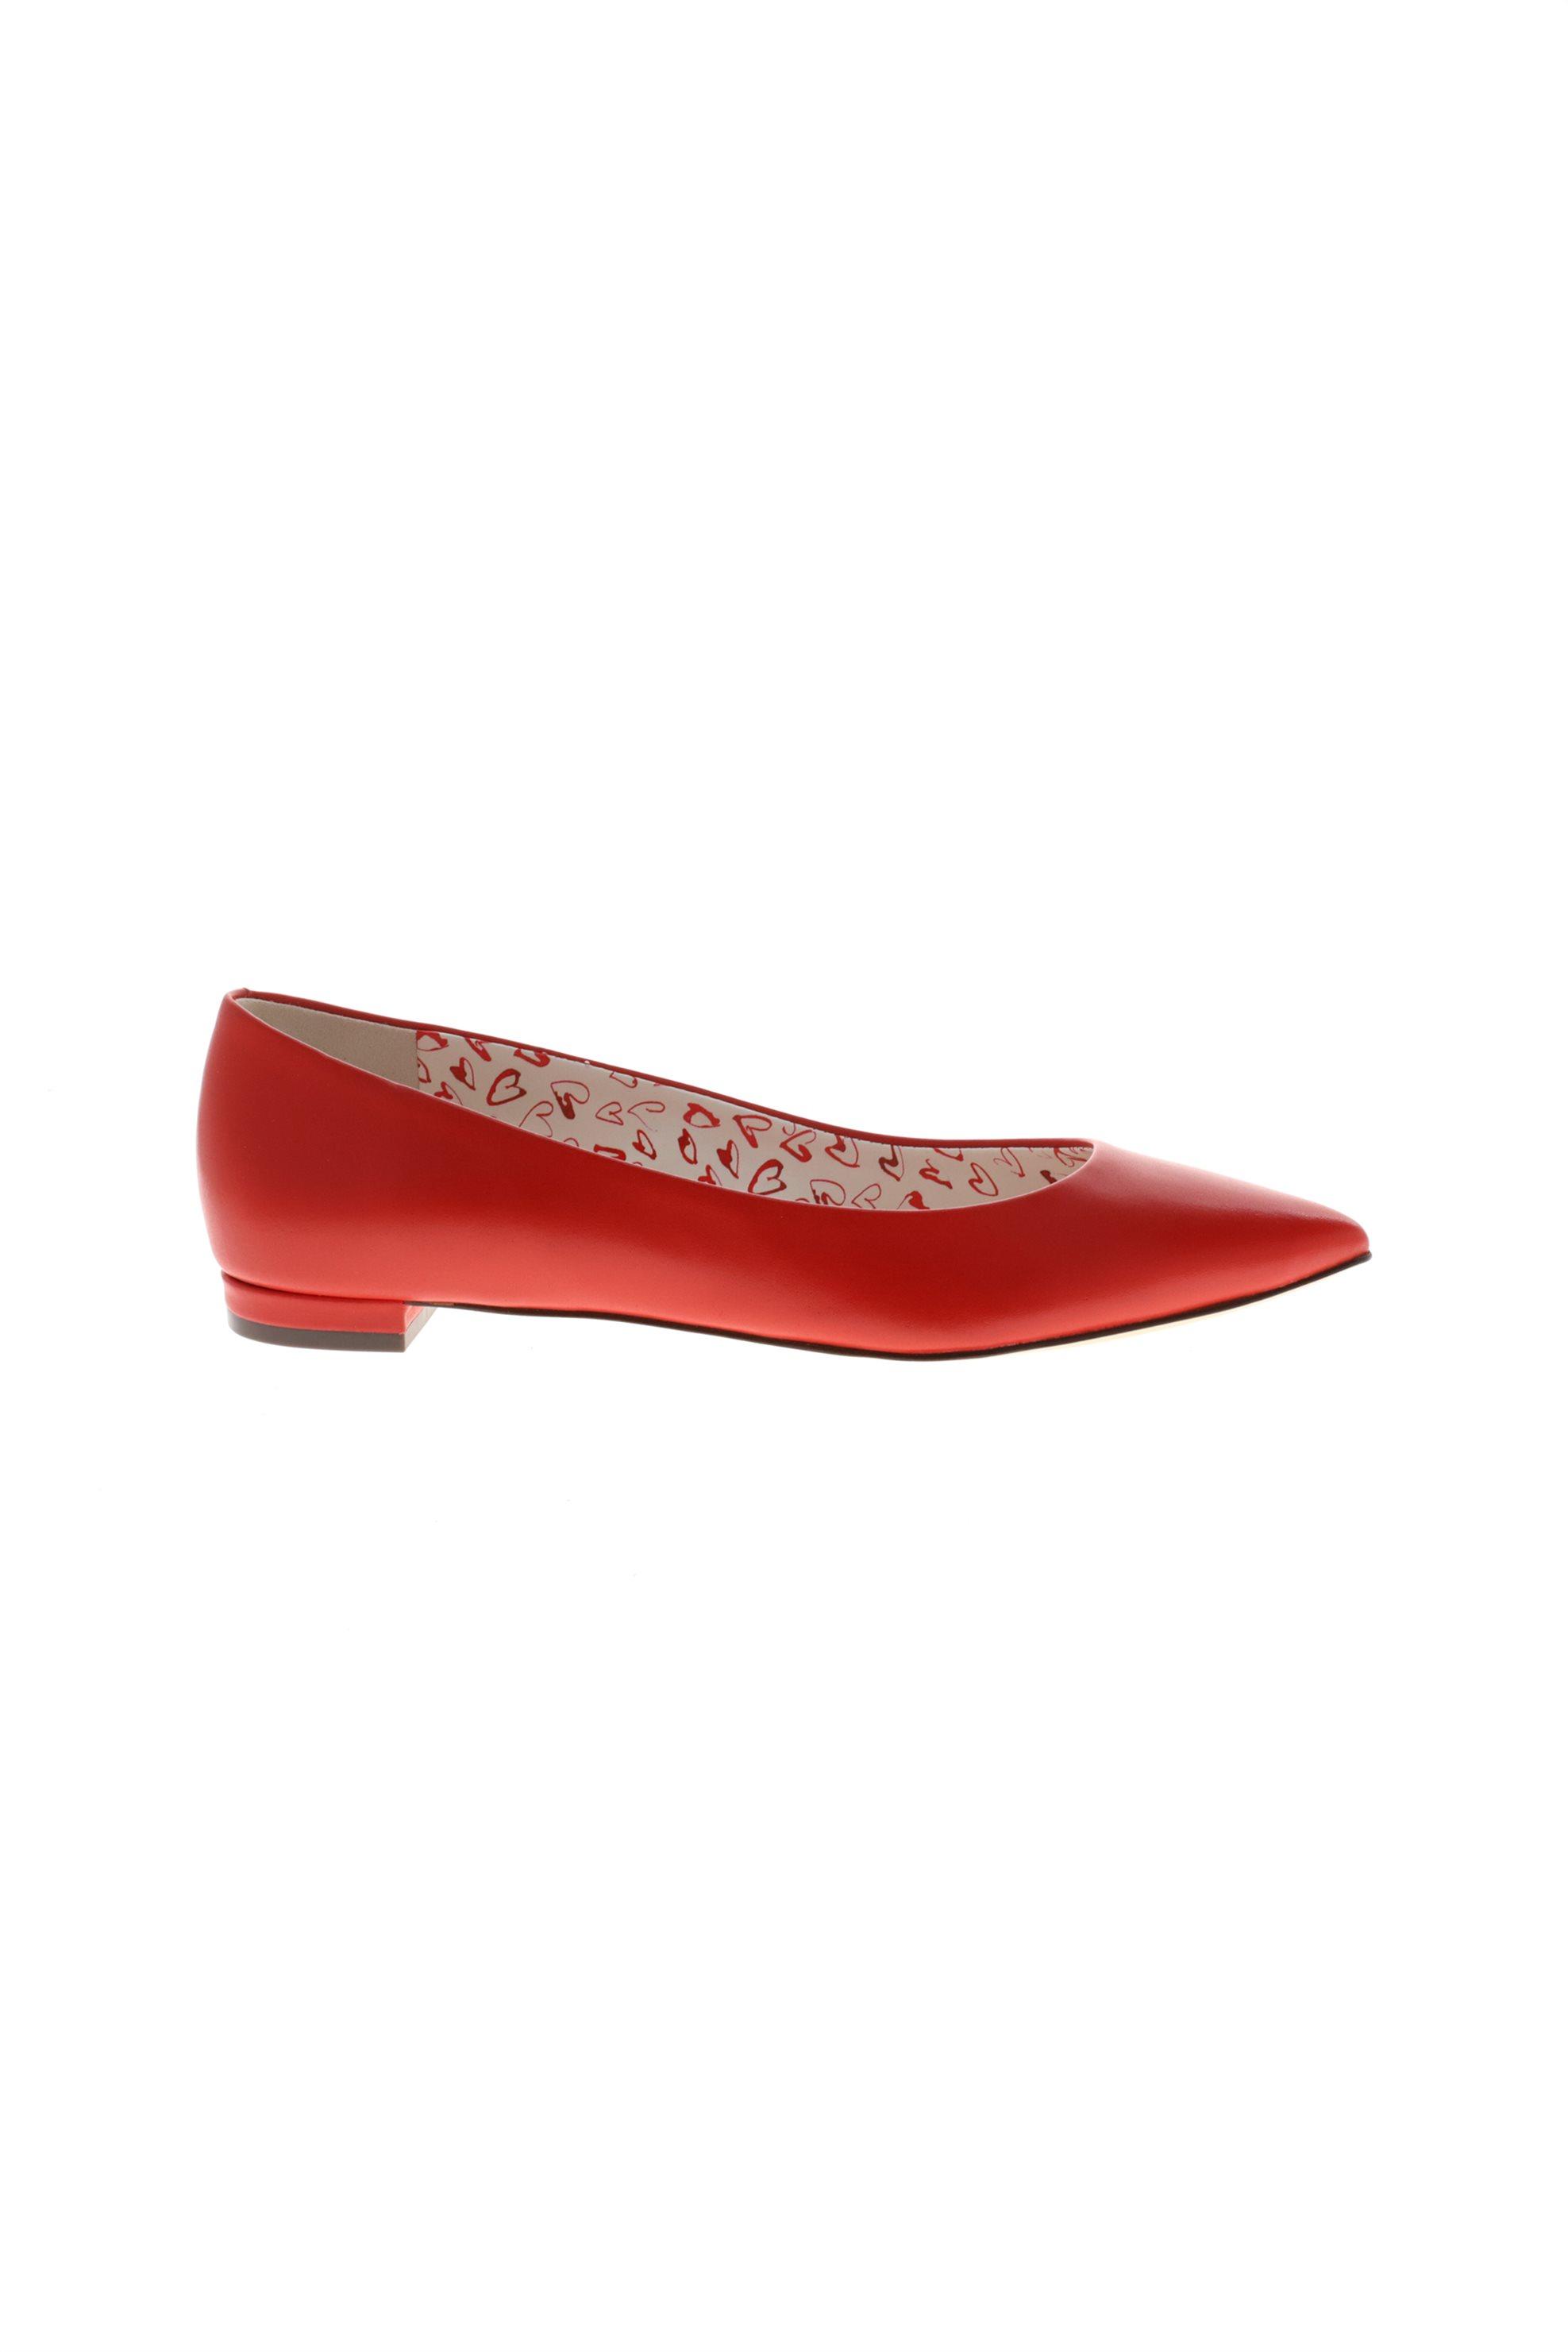 NINE WEST γυναικείες μπαλαρίνες Alicea Flats – 25023531 – Κόκκινο